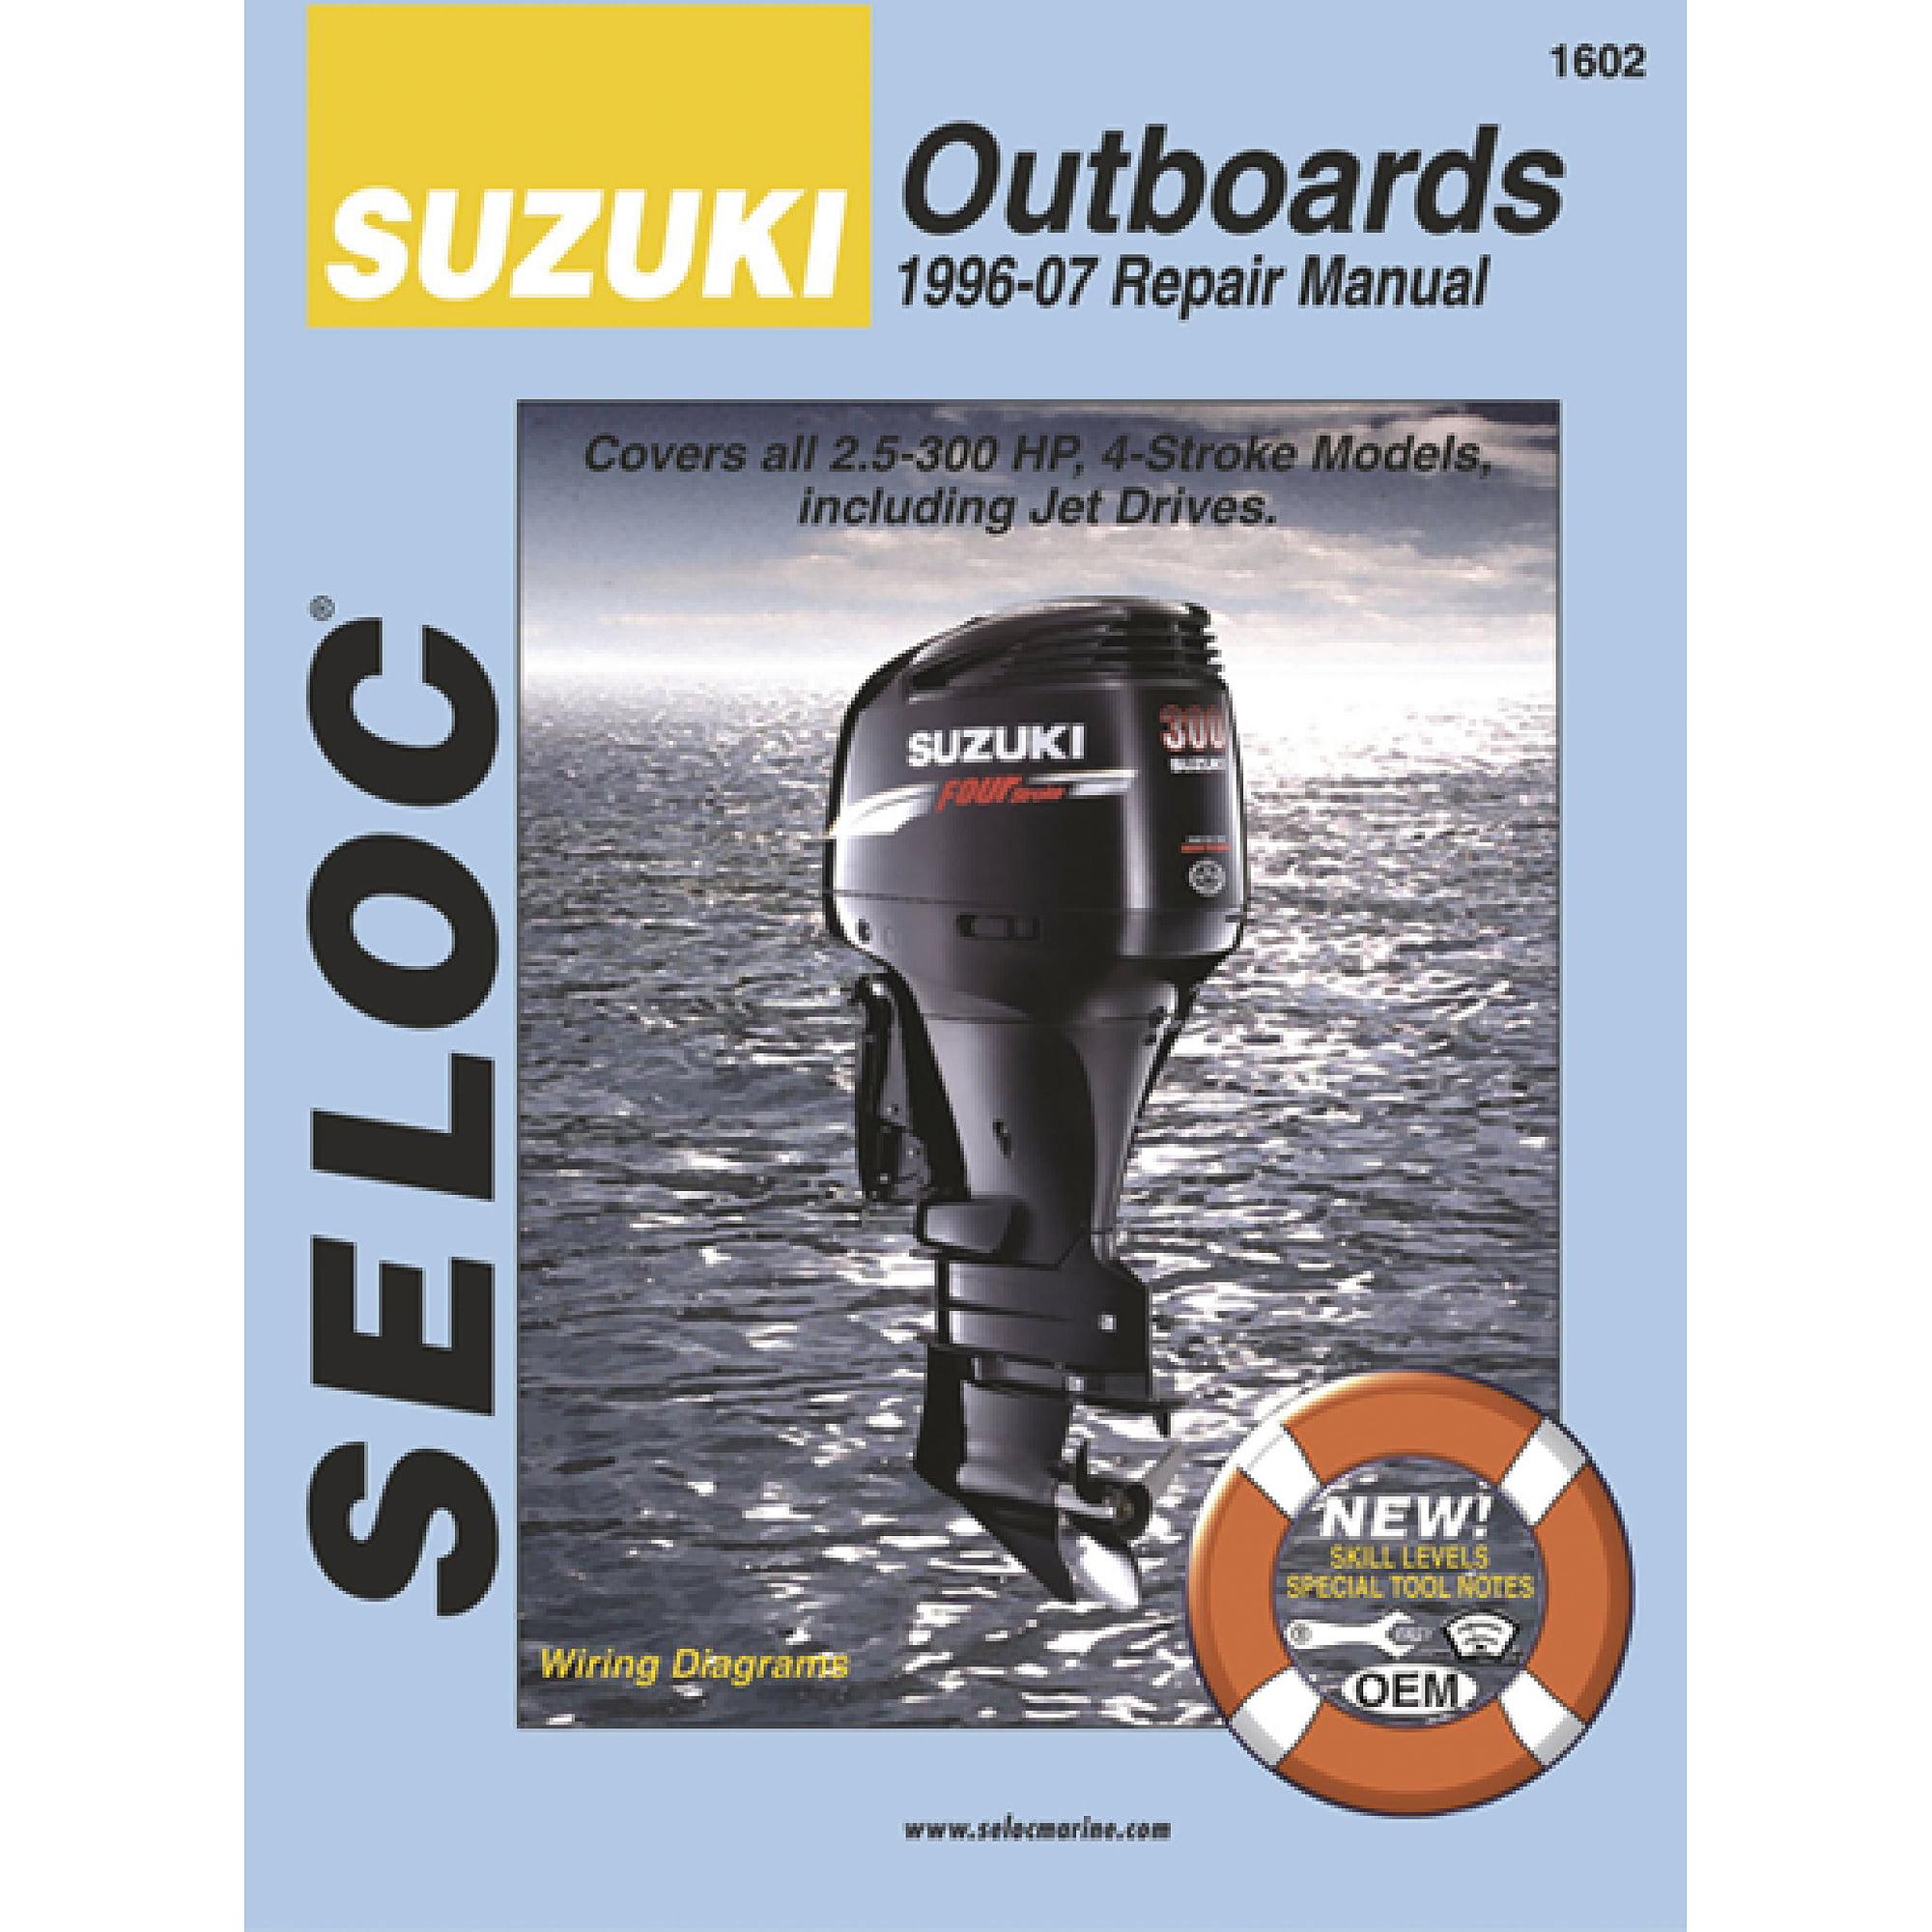 Seloc Marine Manual for Suzuki Outboards